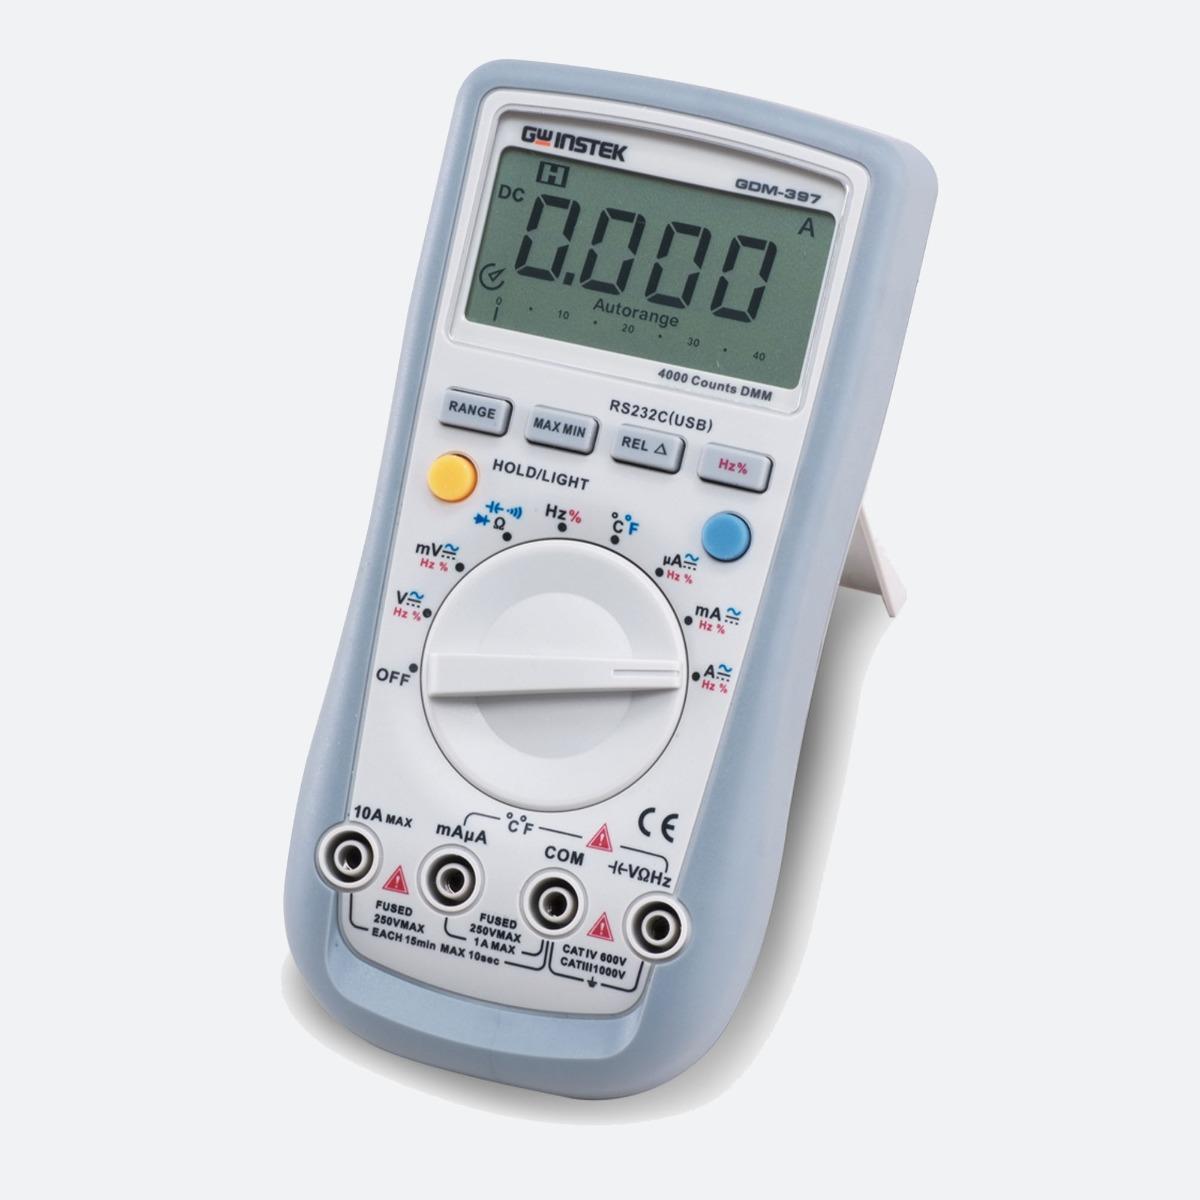 GW Instek GDM-397 Handheld Multimeter CControls